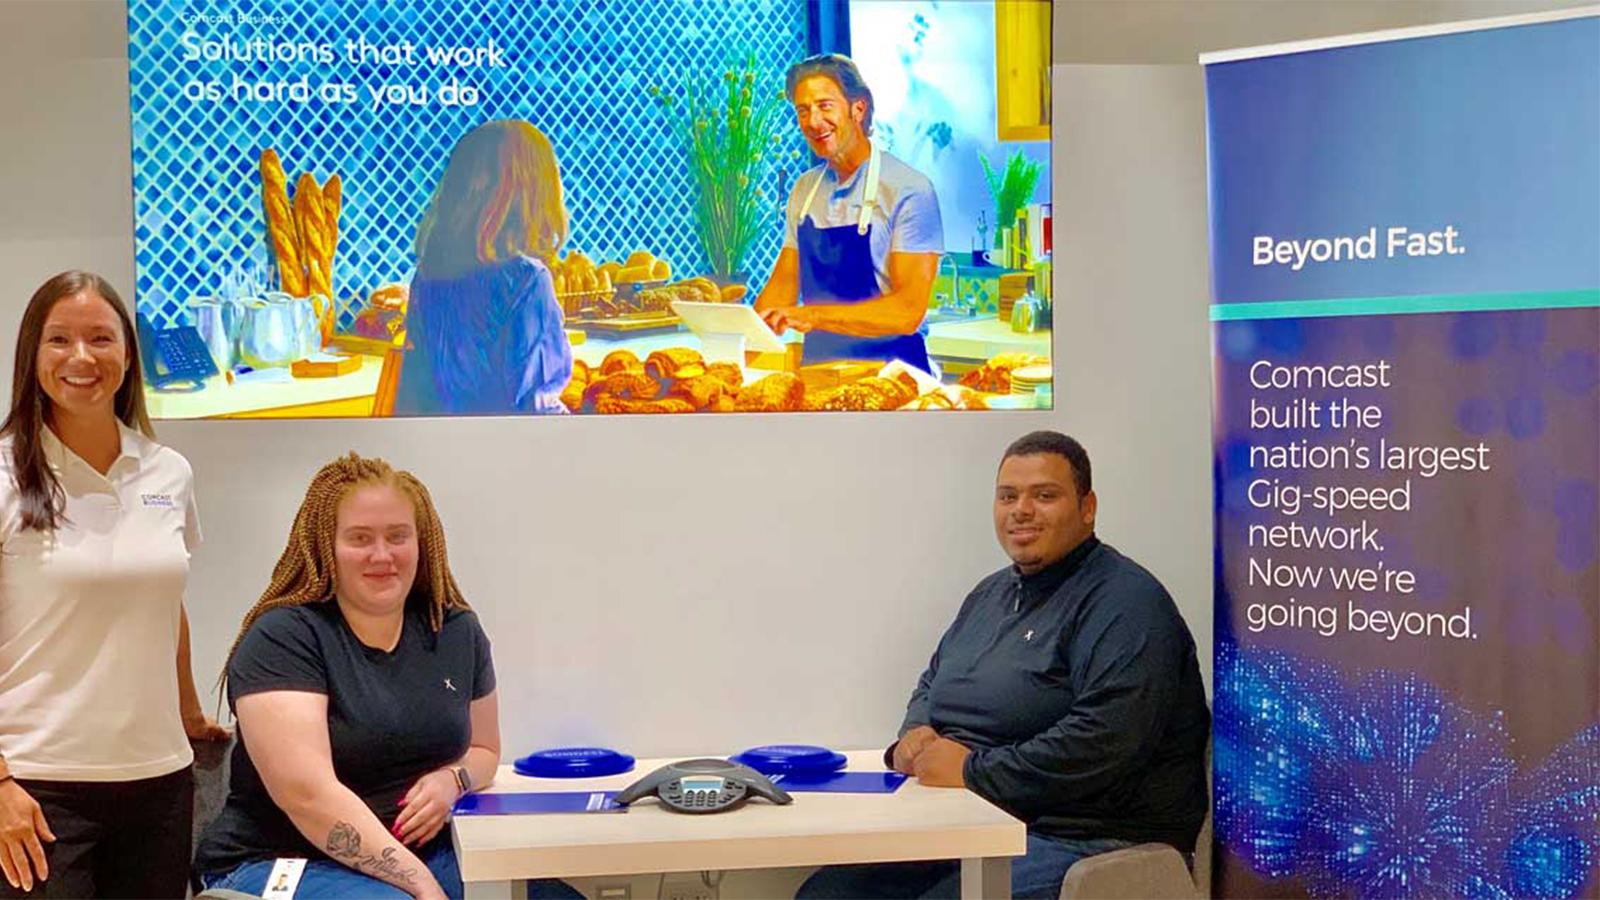 Jerilynn Davidge and team members at an Xfinity store.